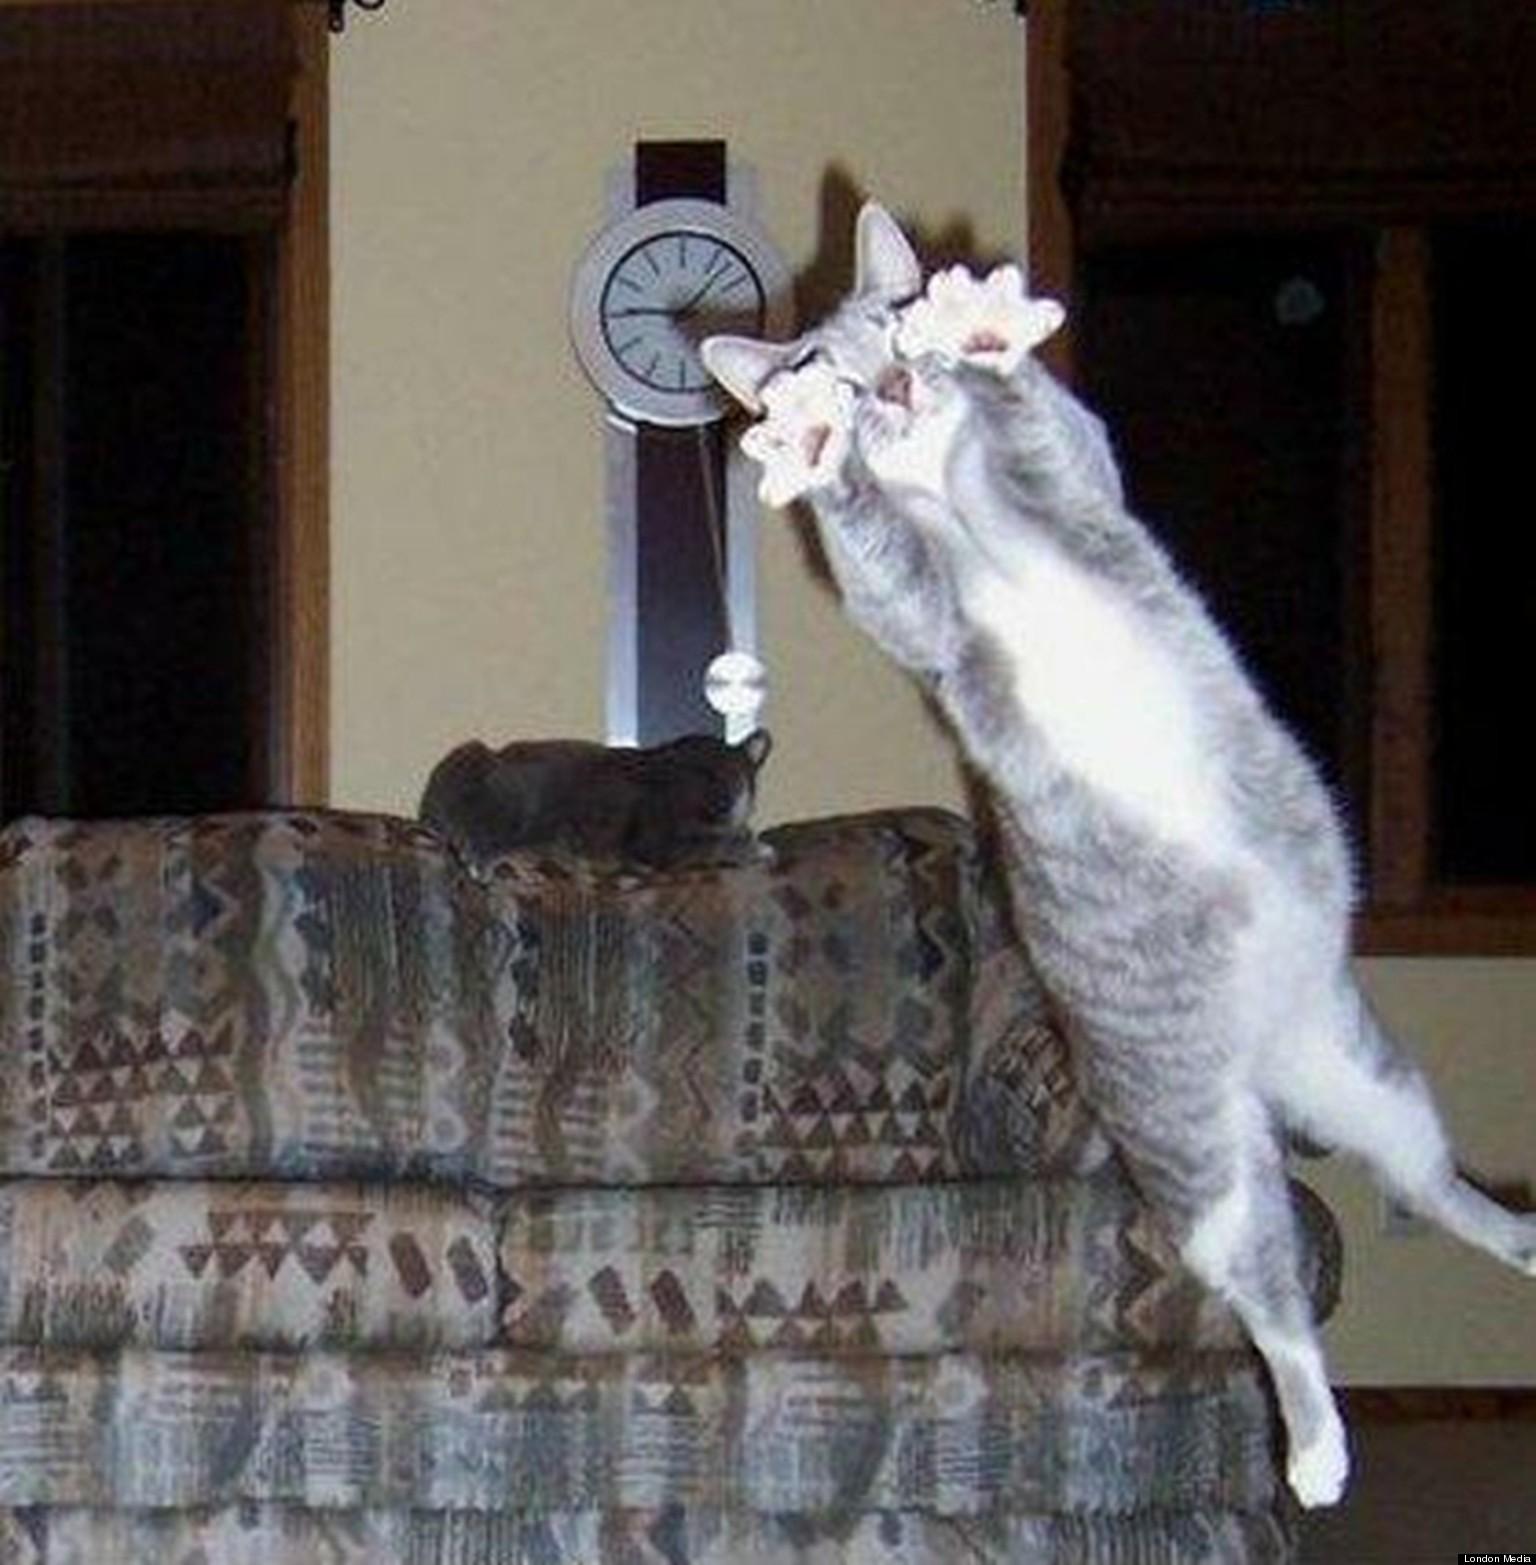 25 amazing animal photobombs   digital hd photos